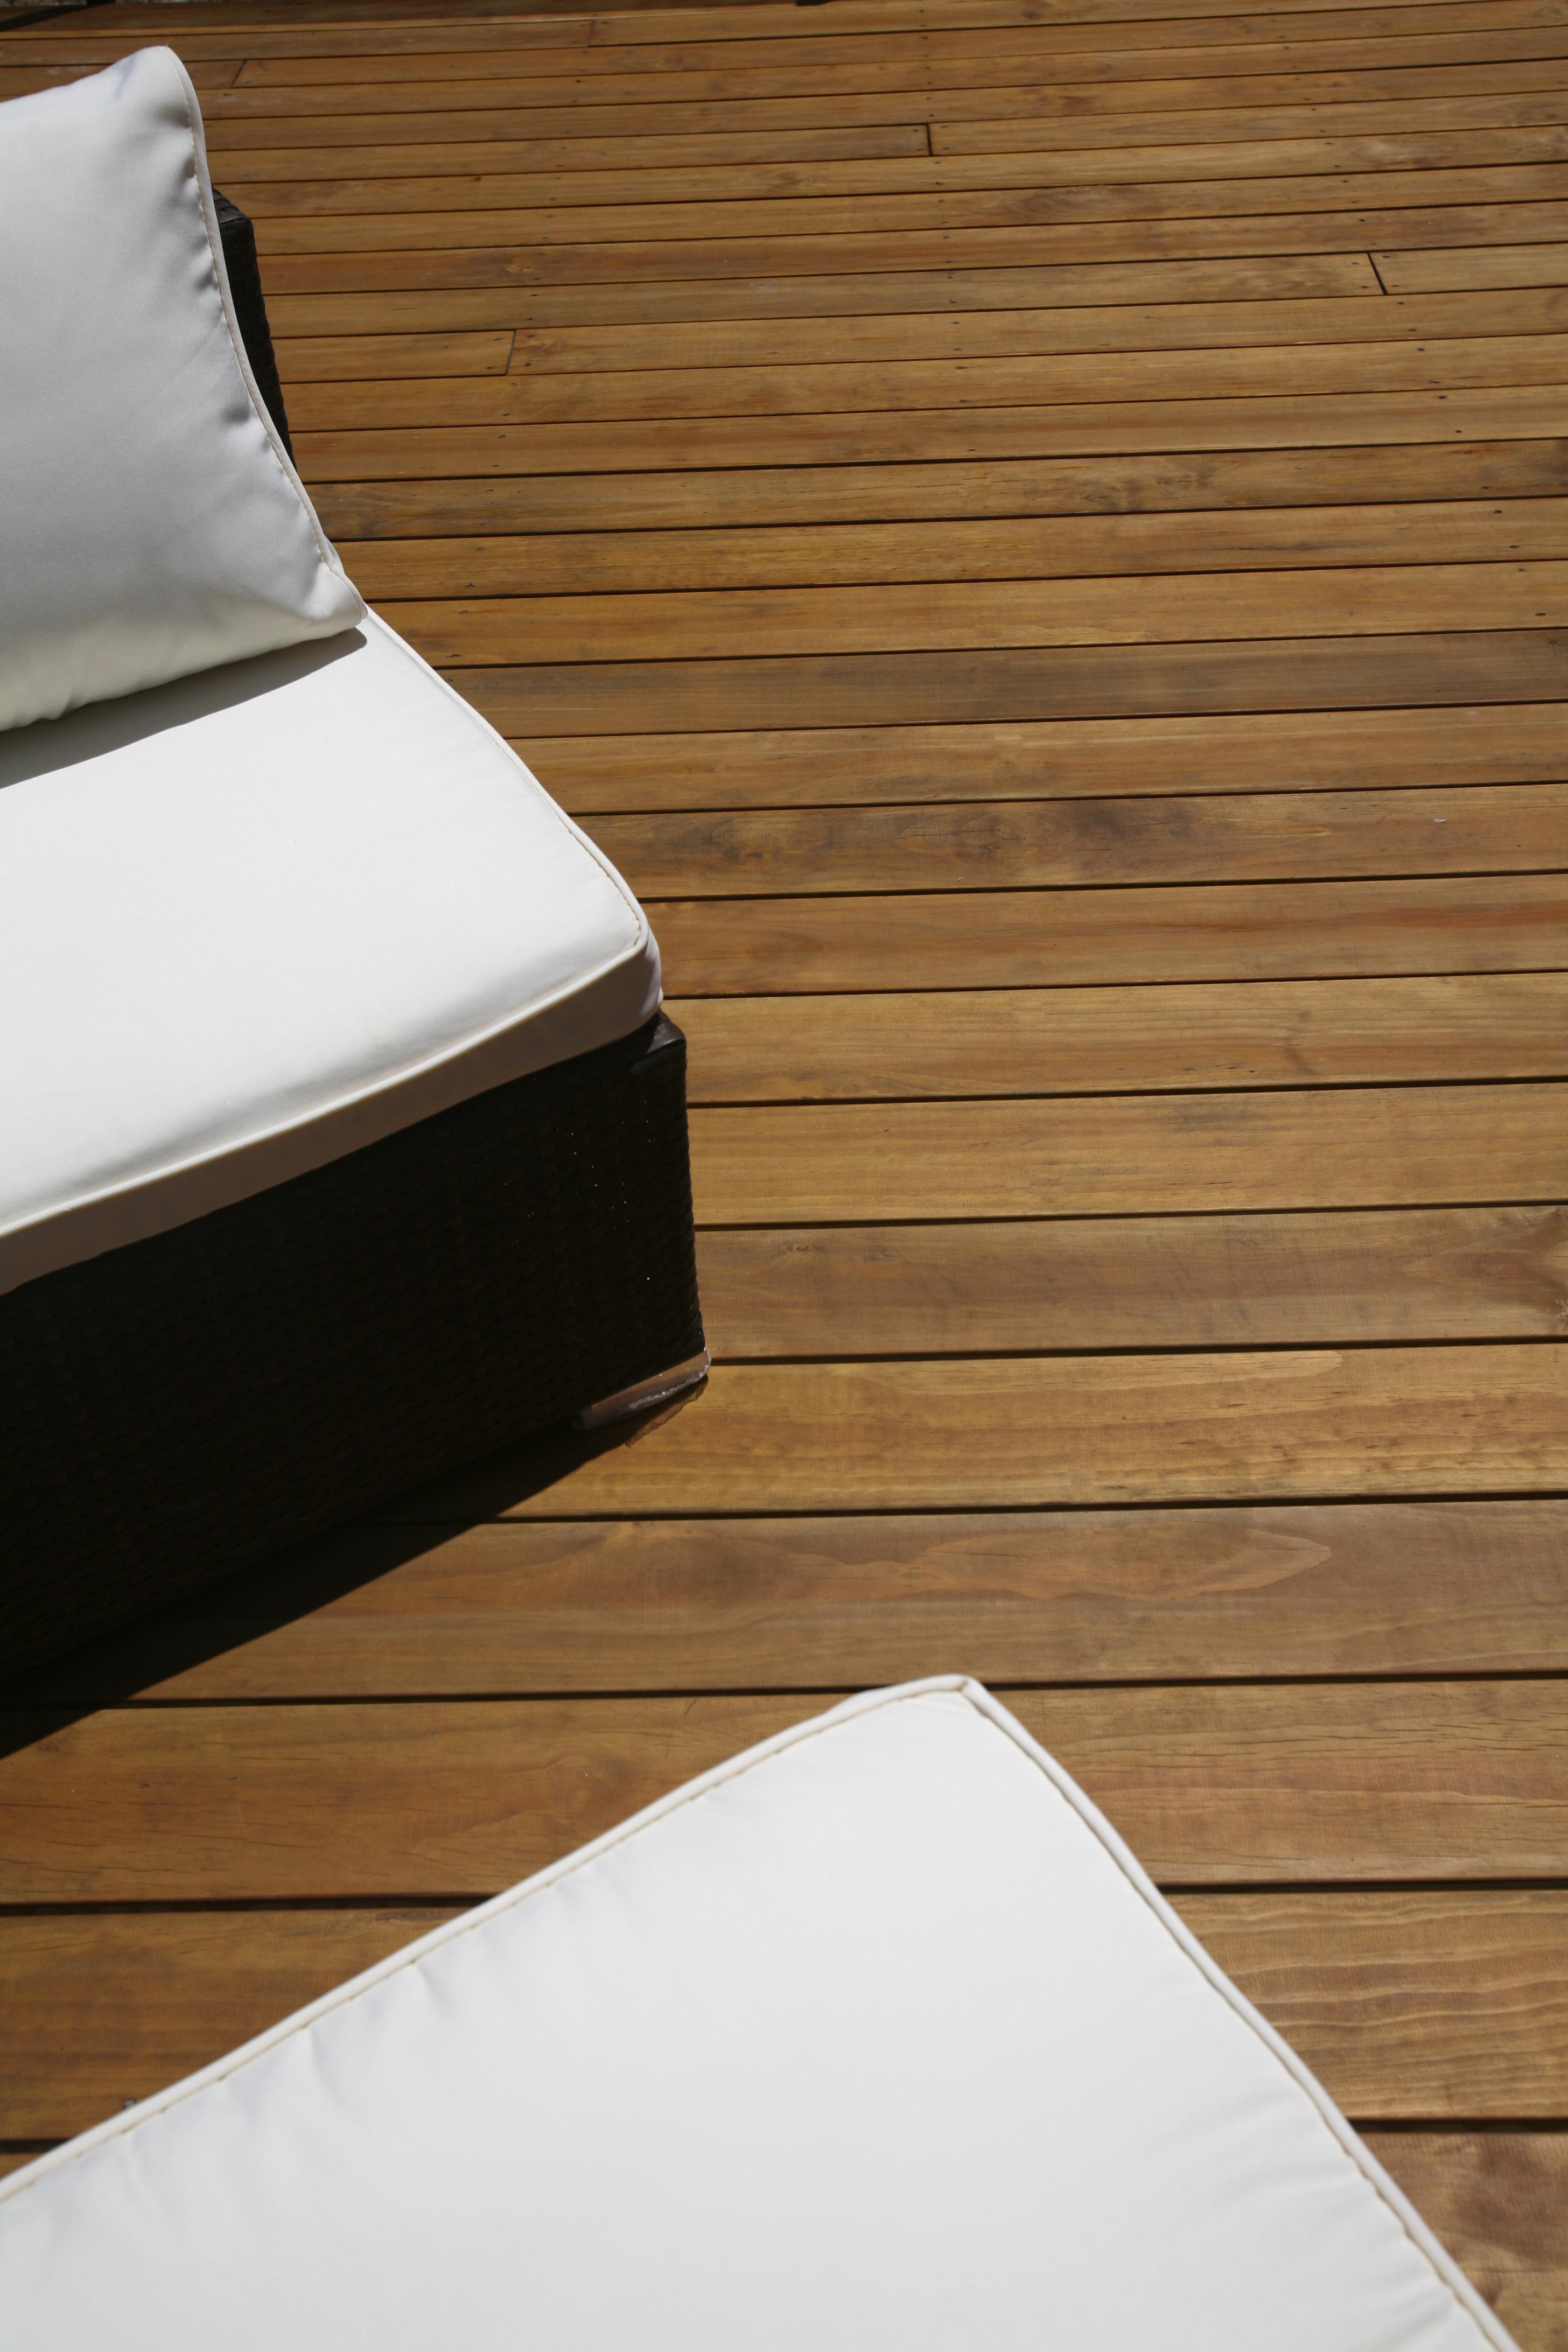 Deck-uri lemn DuraPine - Poza 2